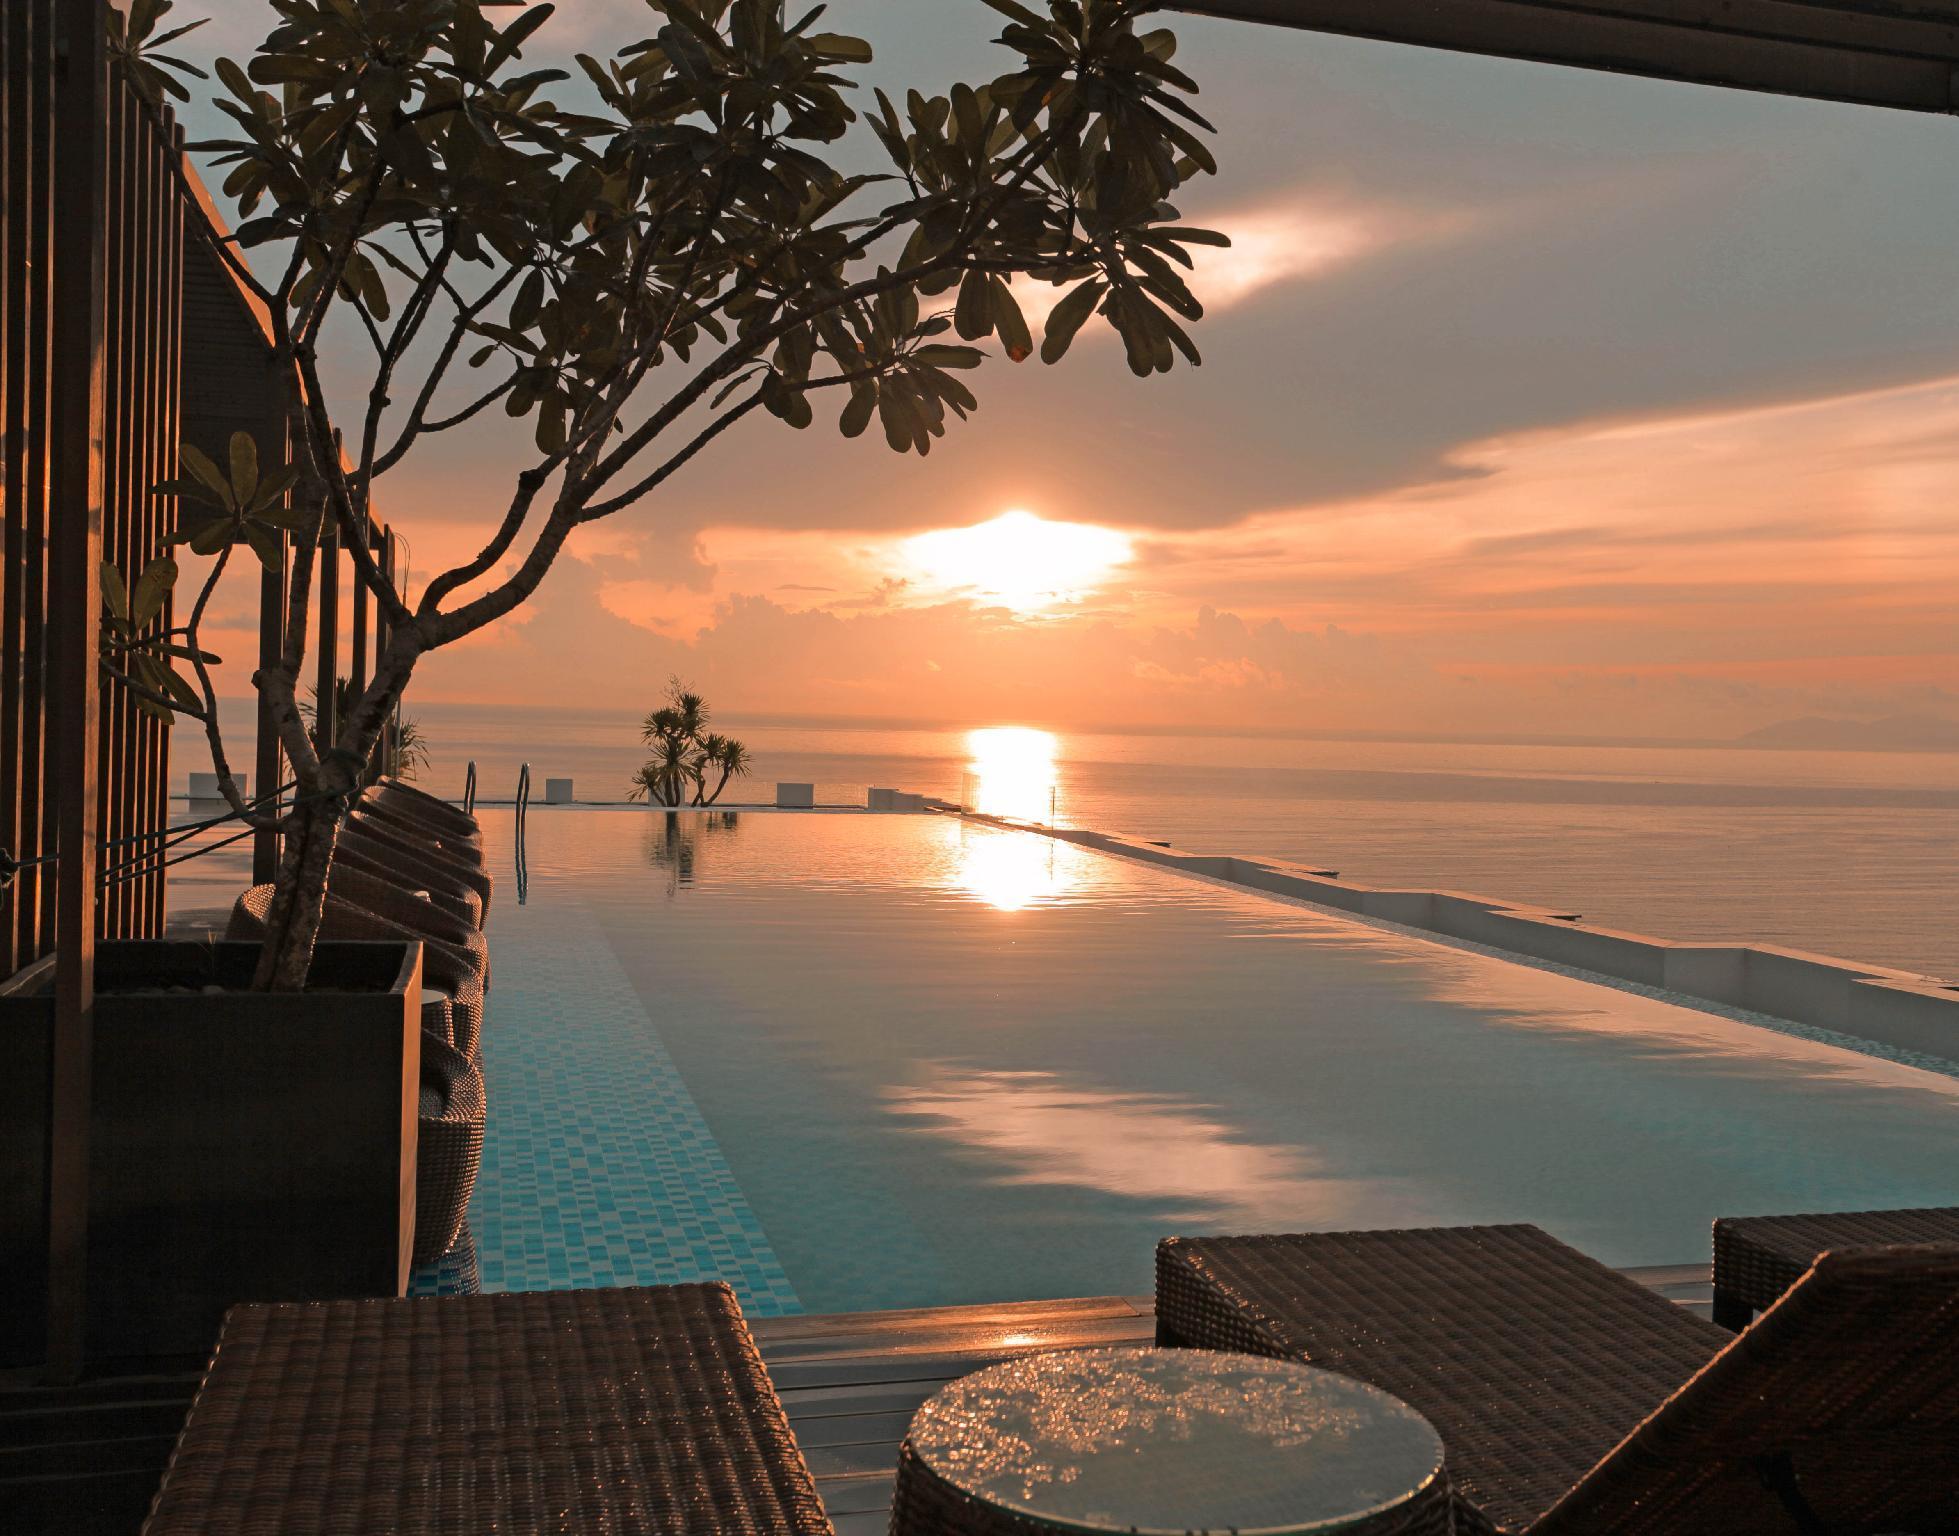 HAIAN Beach Hotel And Spa